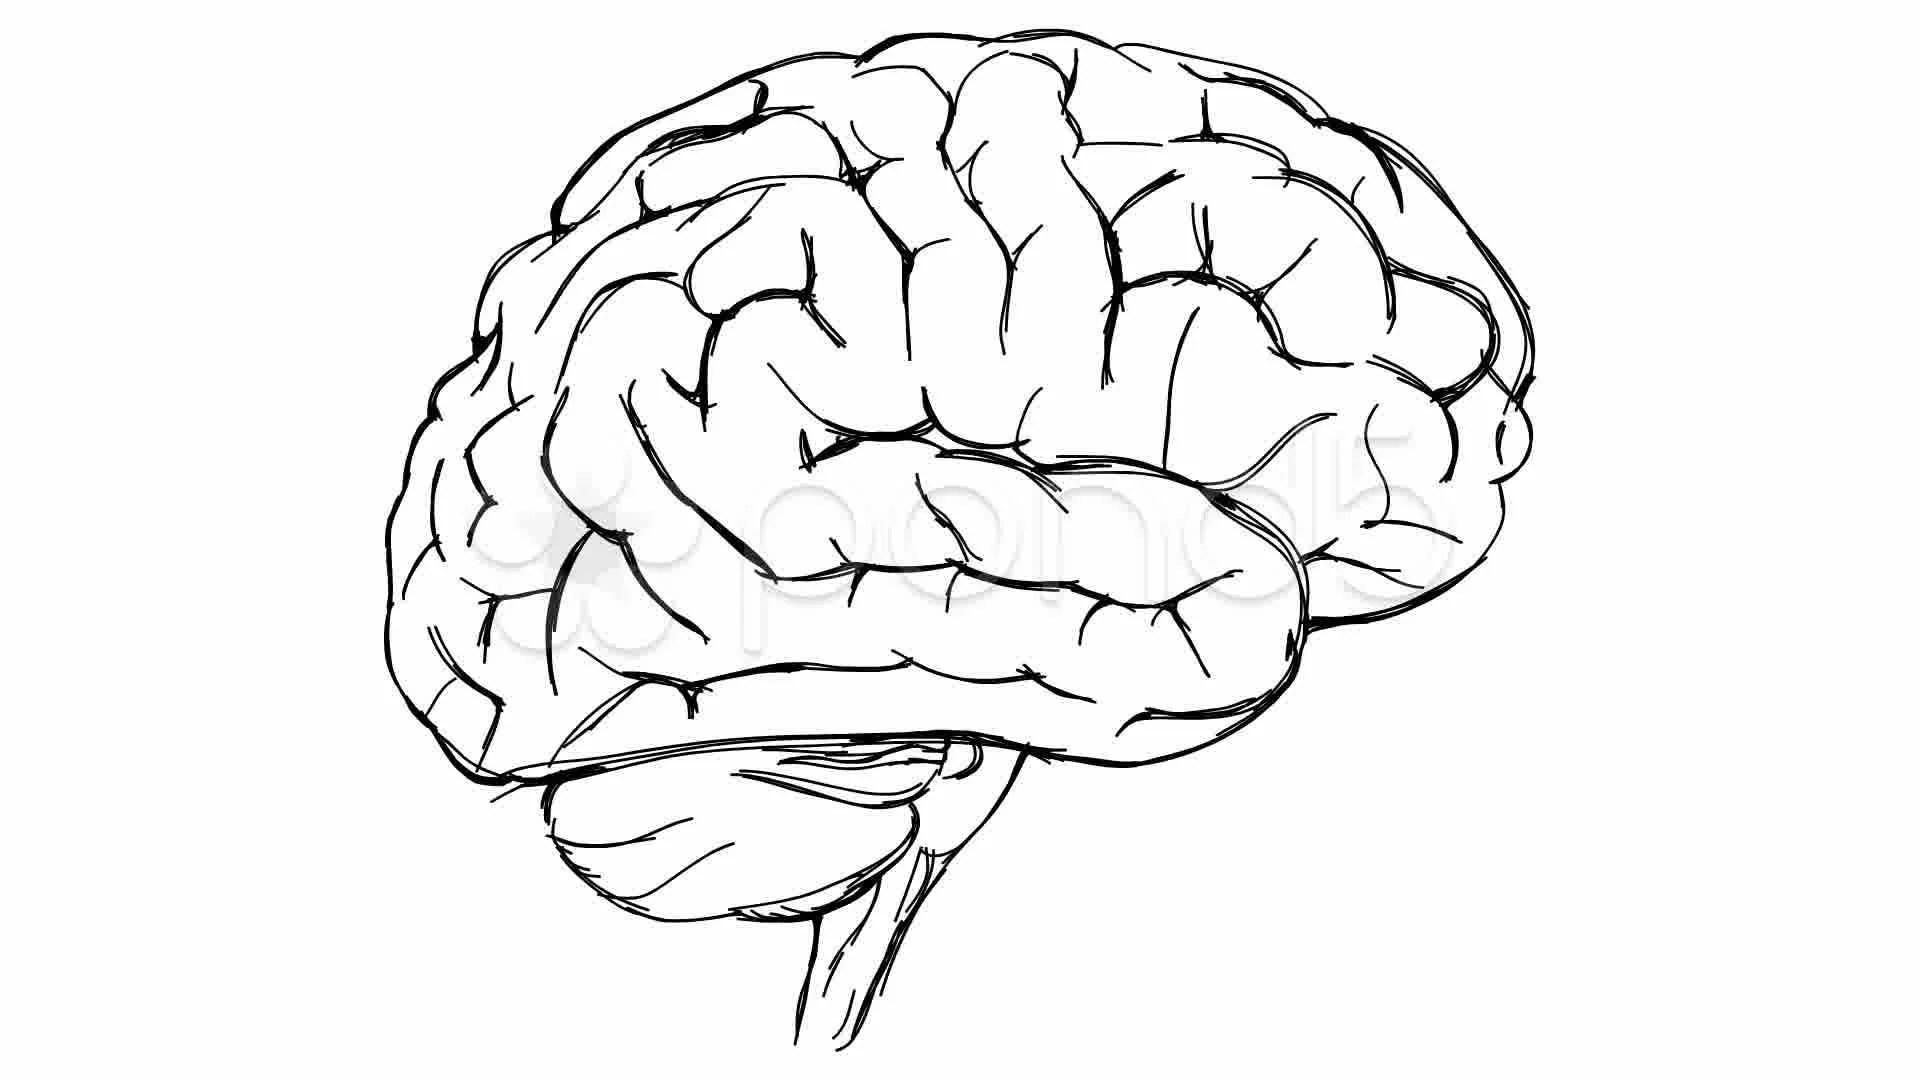 Brain Sketch Video Clip Royalty Free